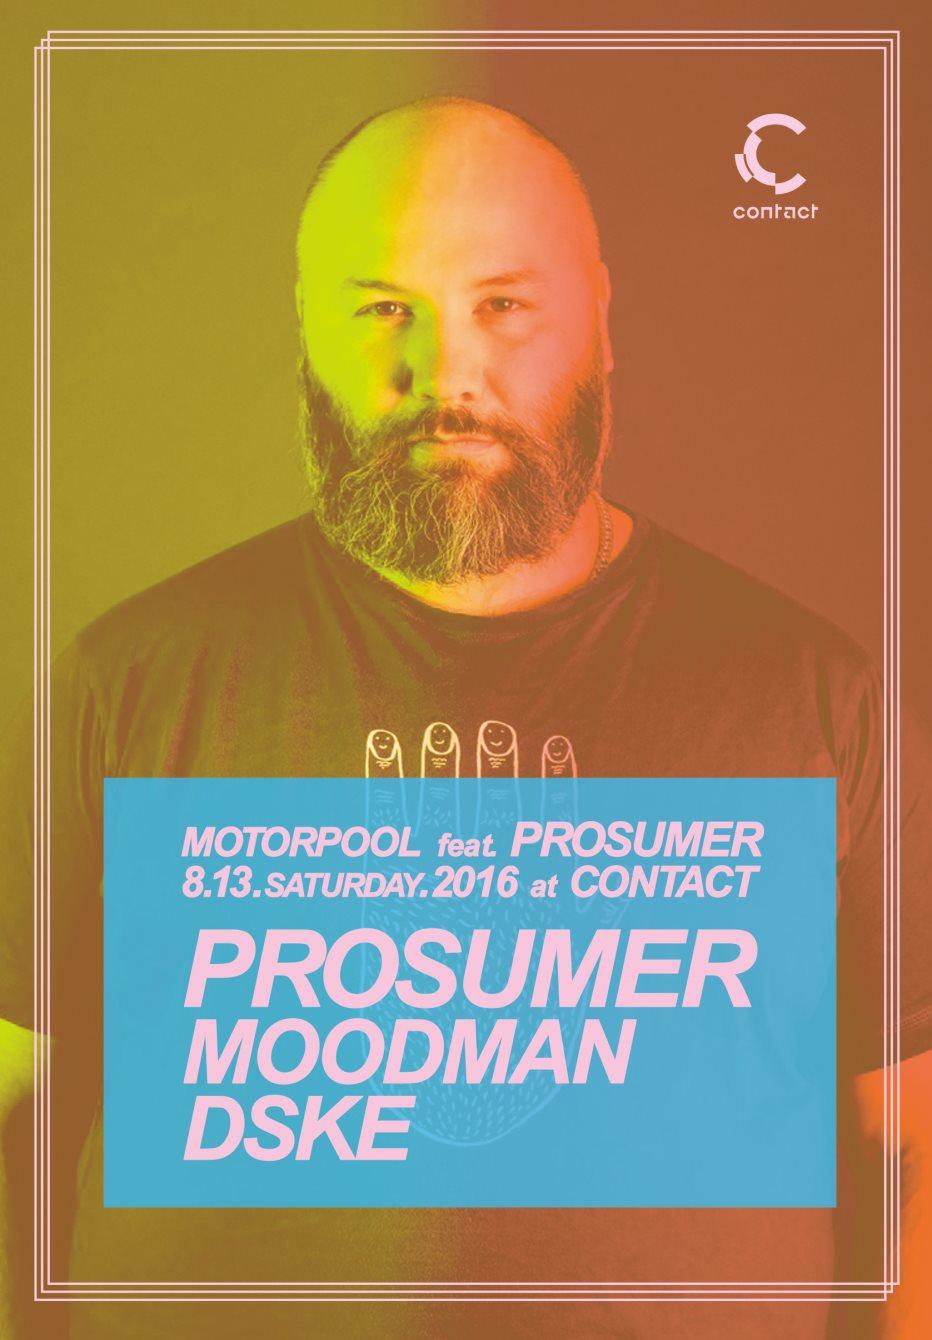 Motorpool Feat. Prosumer - Flyer front